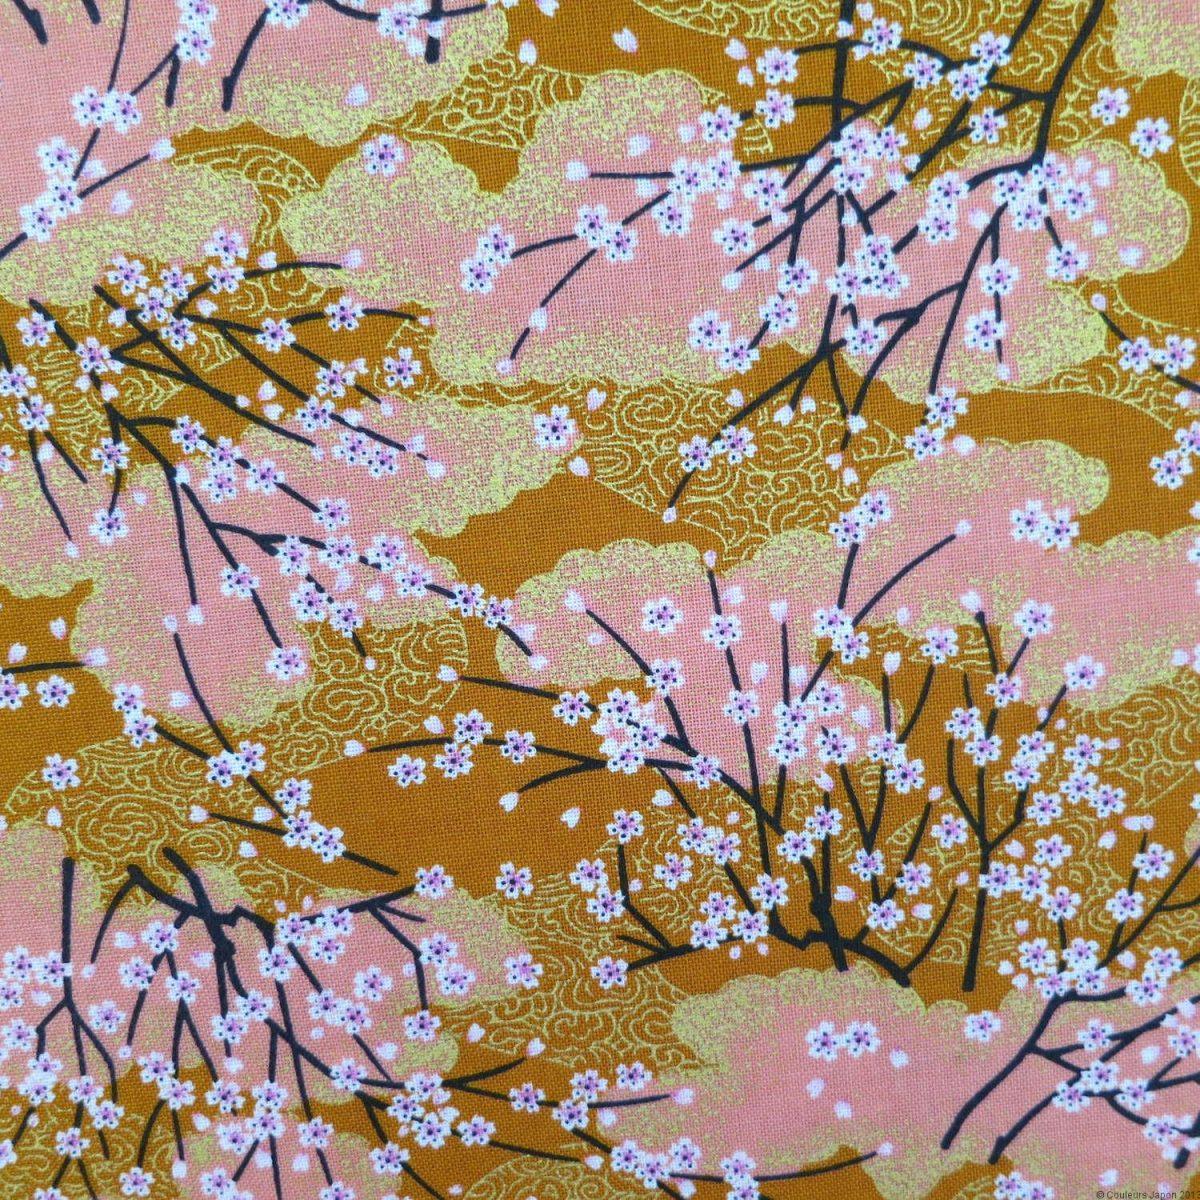 Tissu fleurs de cerisier sur fond ocre